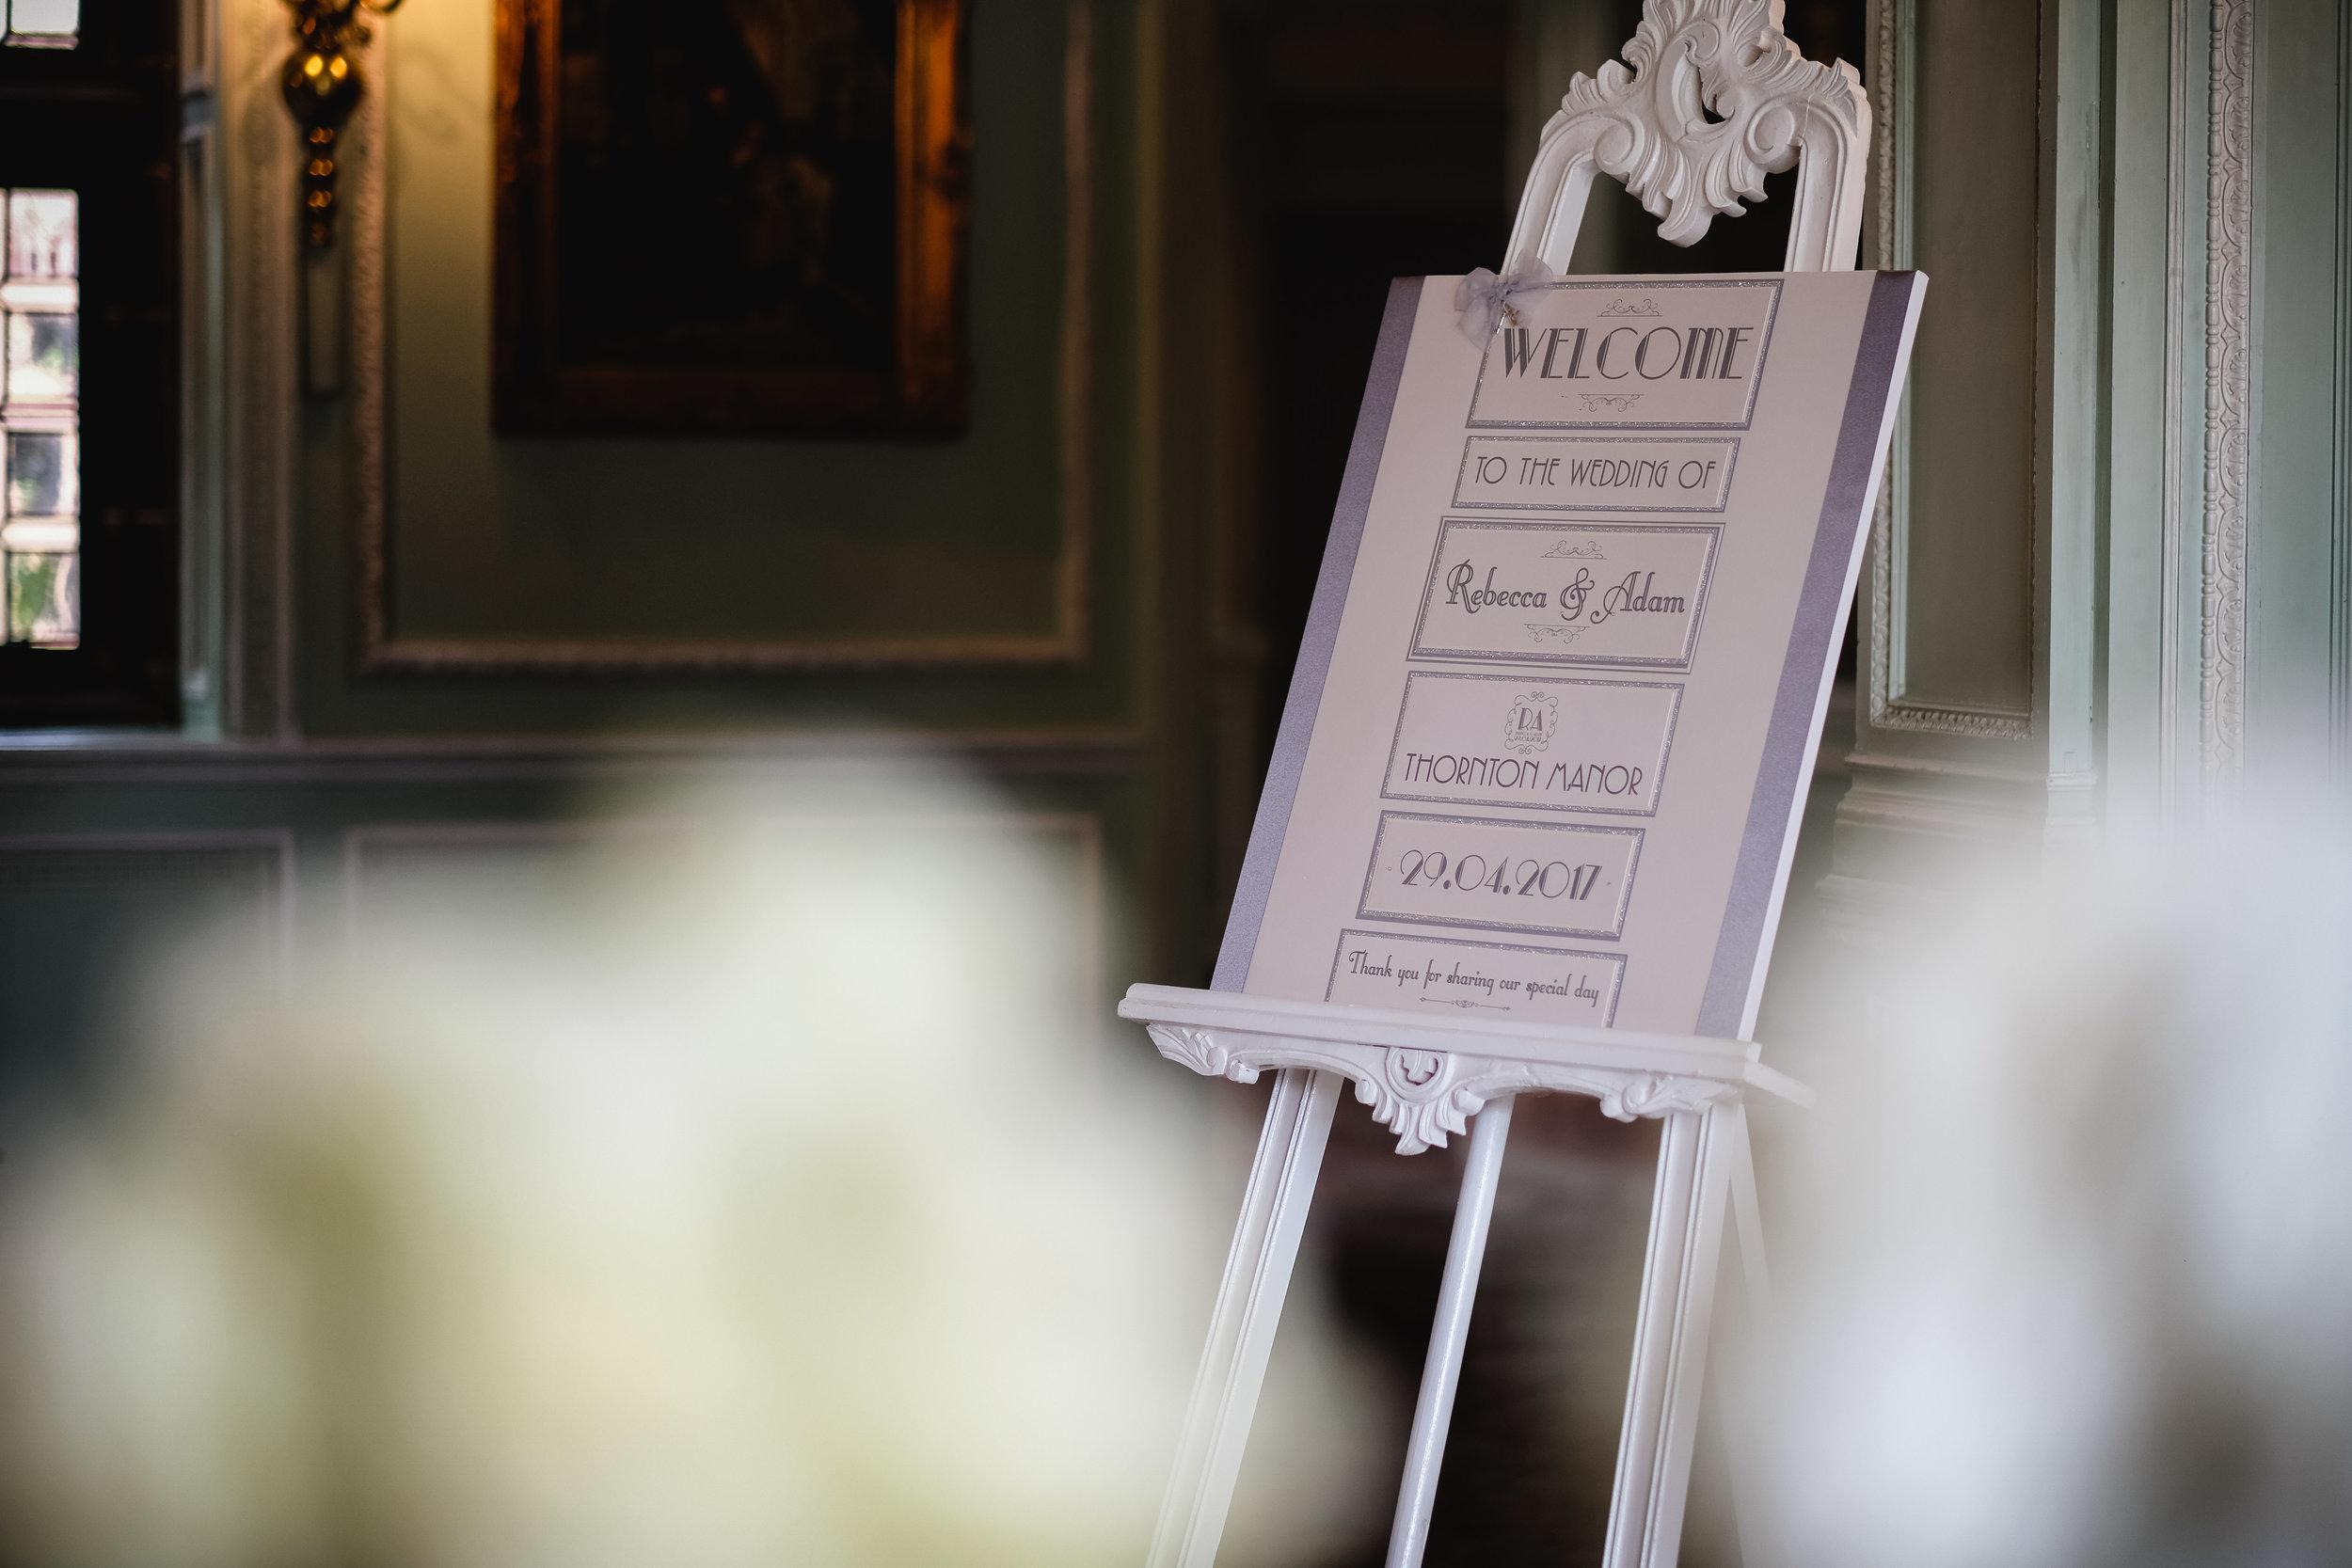 Thornton manor wedding photography cheshire wedding photographer liverpool manchester warrington chester wirral wedding BLOG (16 of 108).jpg